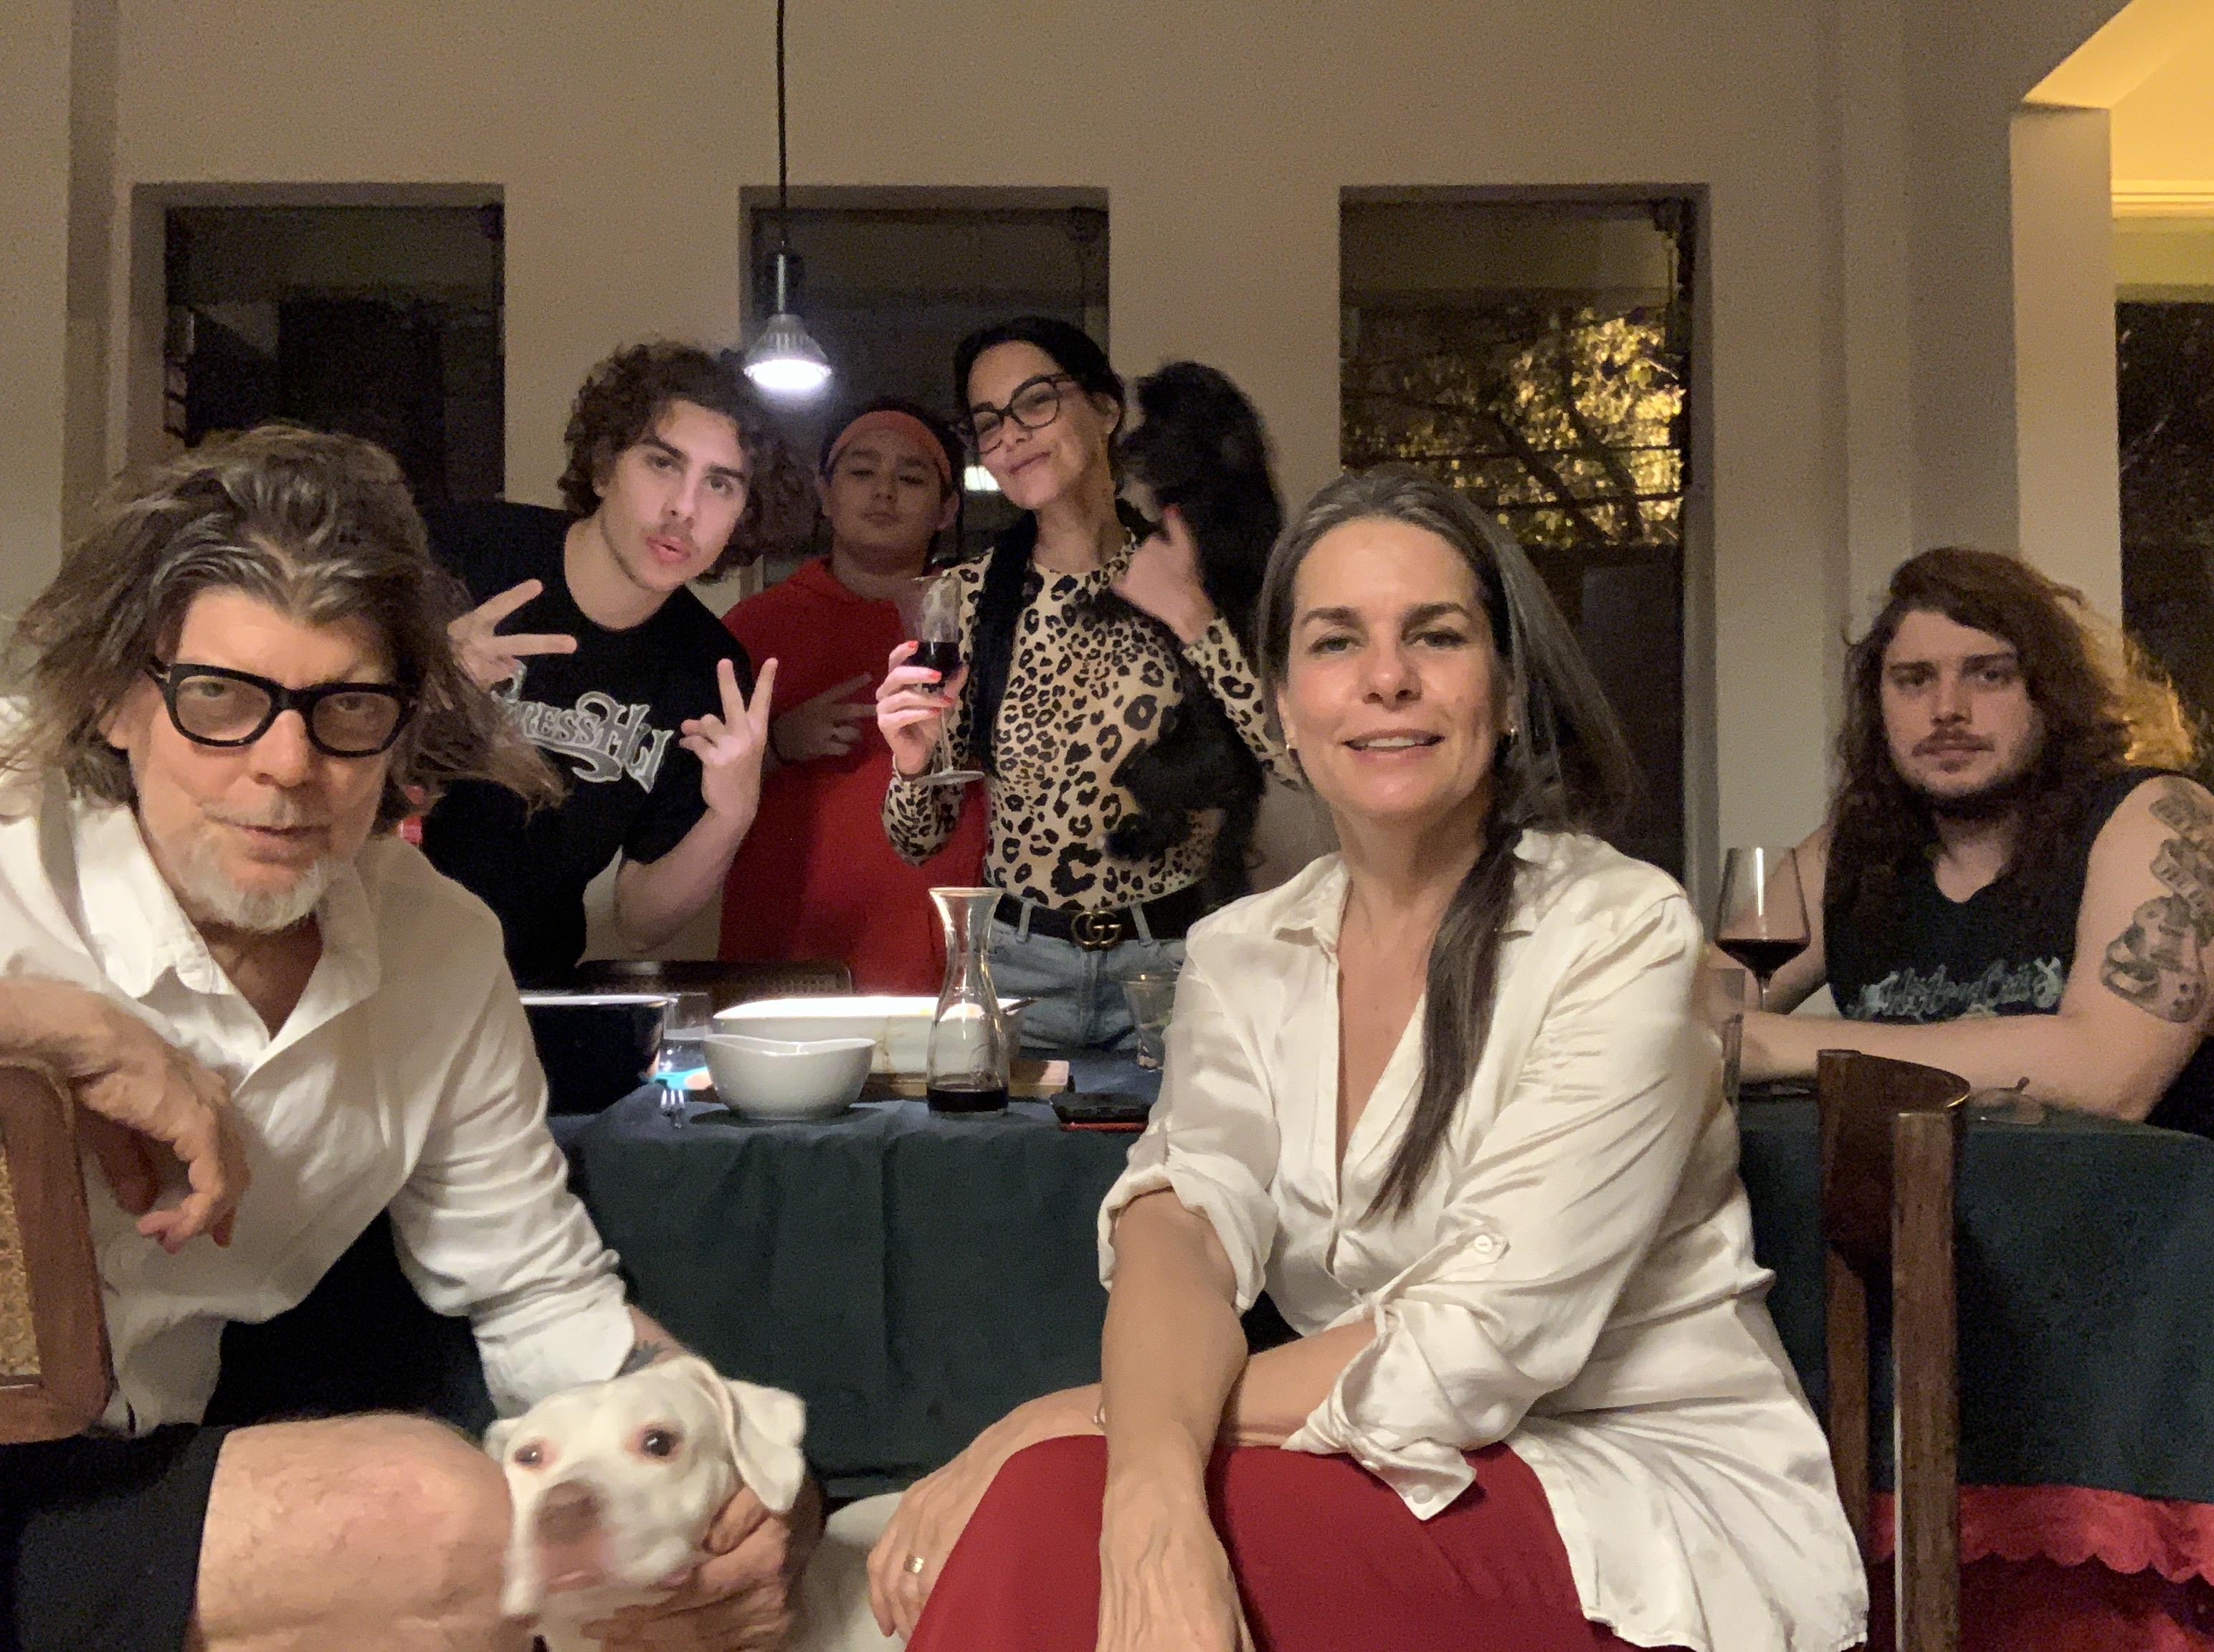 Branco Mello e Angela Figueiredo: